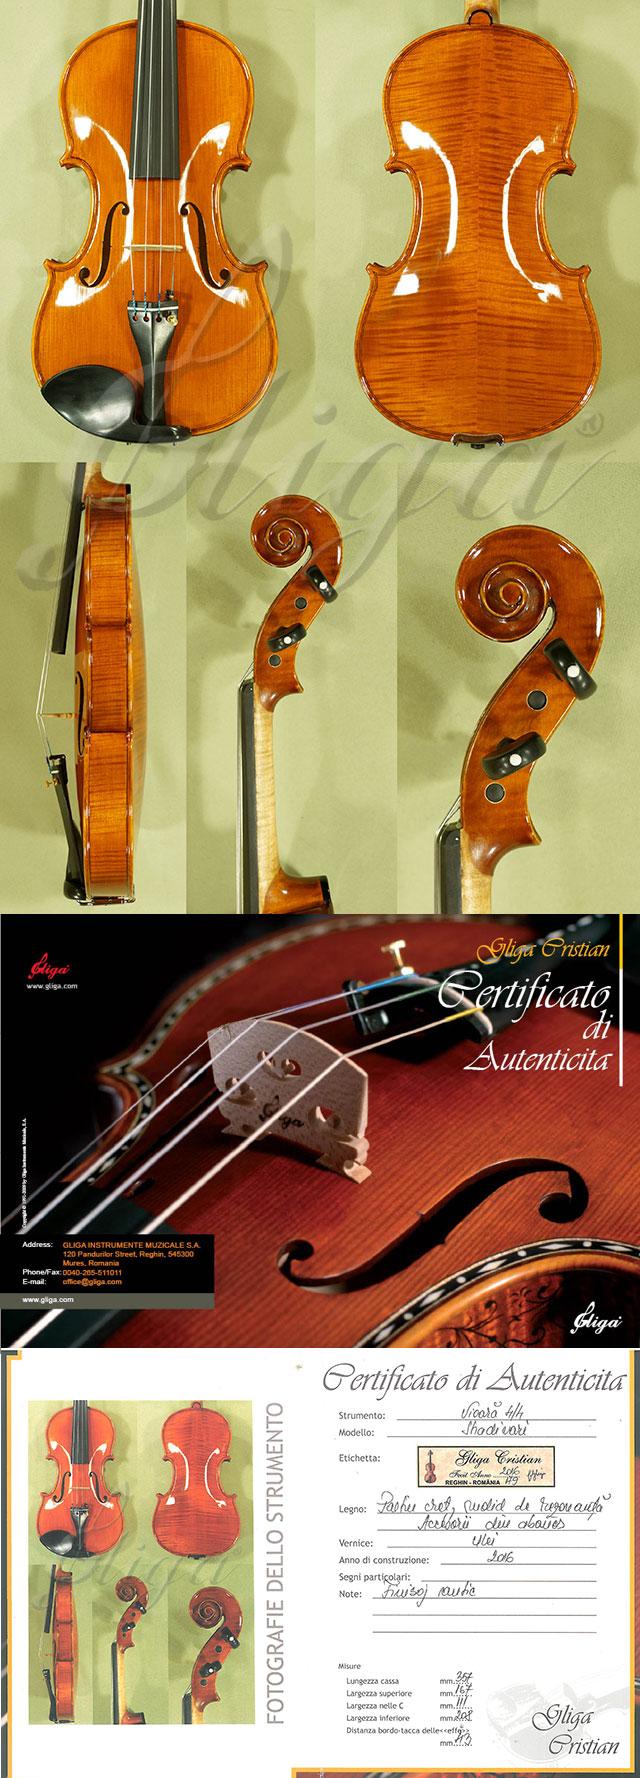 Shiny Antiqued 4/4 MAESTRO GLIGA Violin